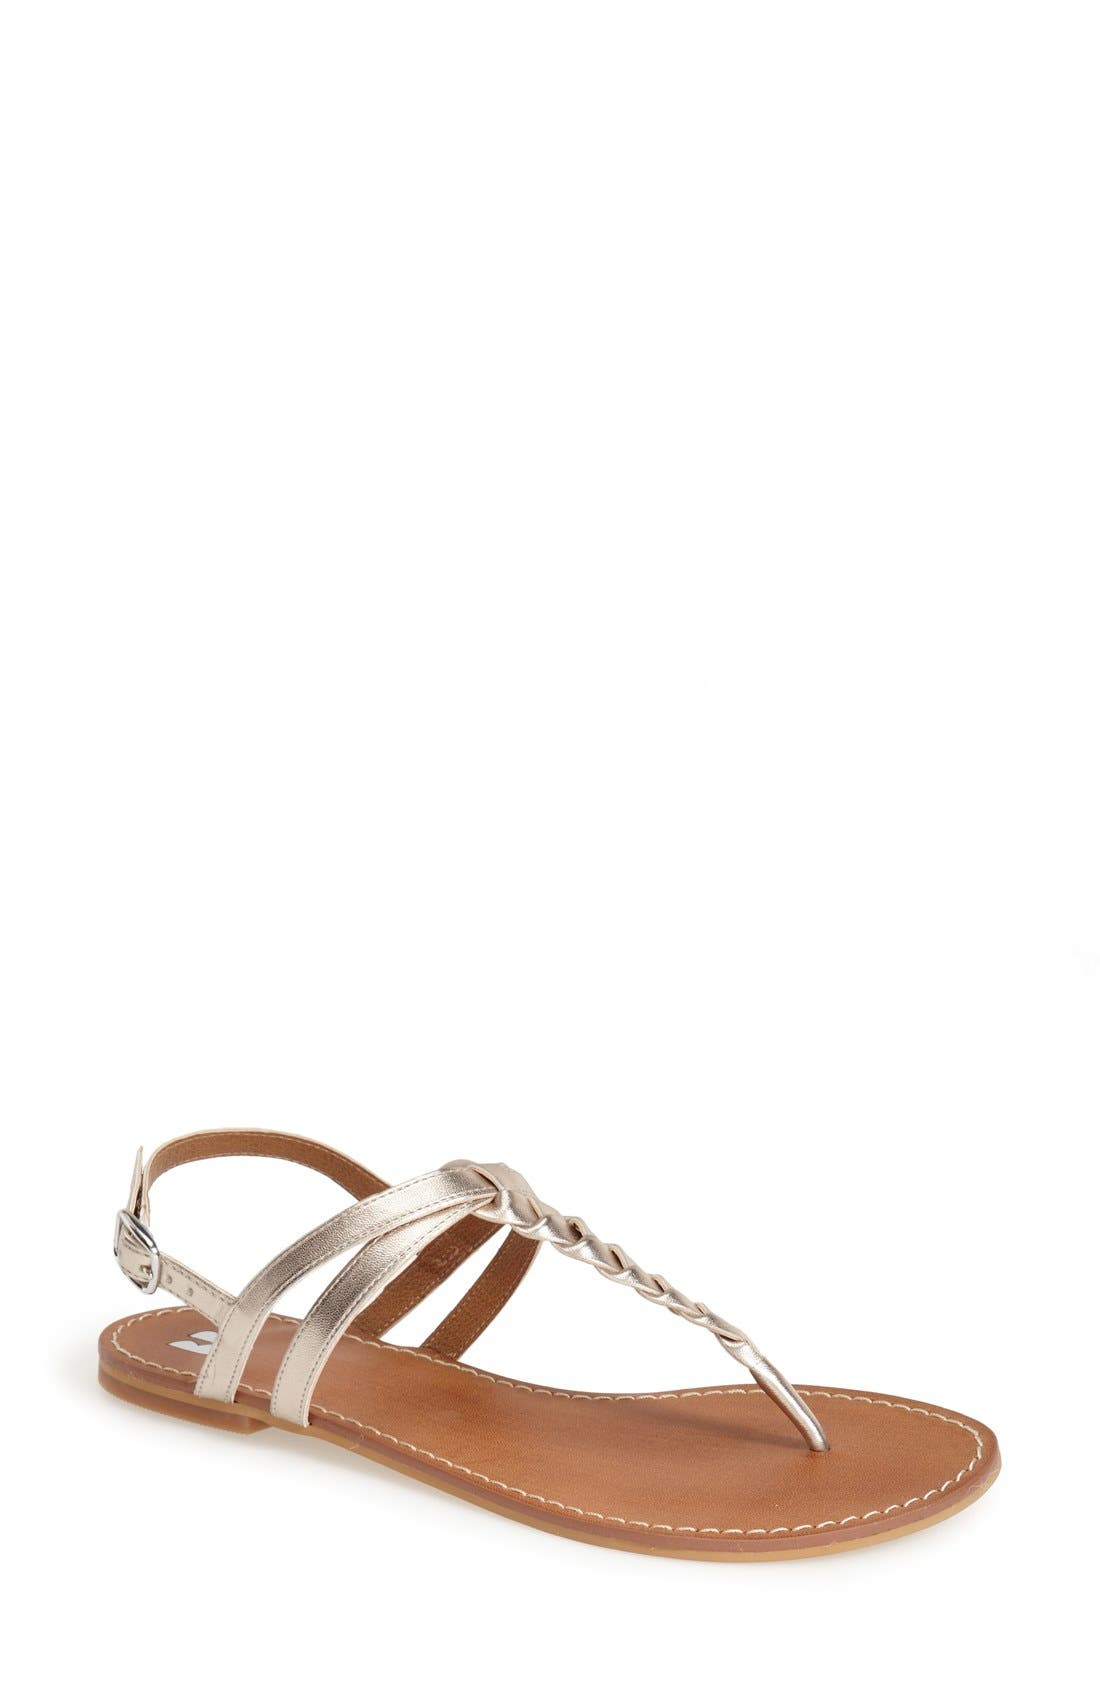 Main Image - BP. 'Surf' Flat Sandal (Women)